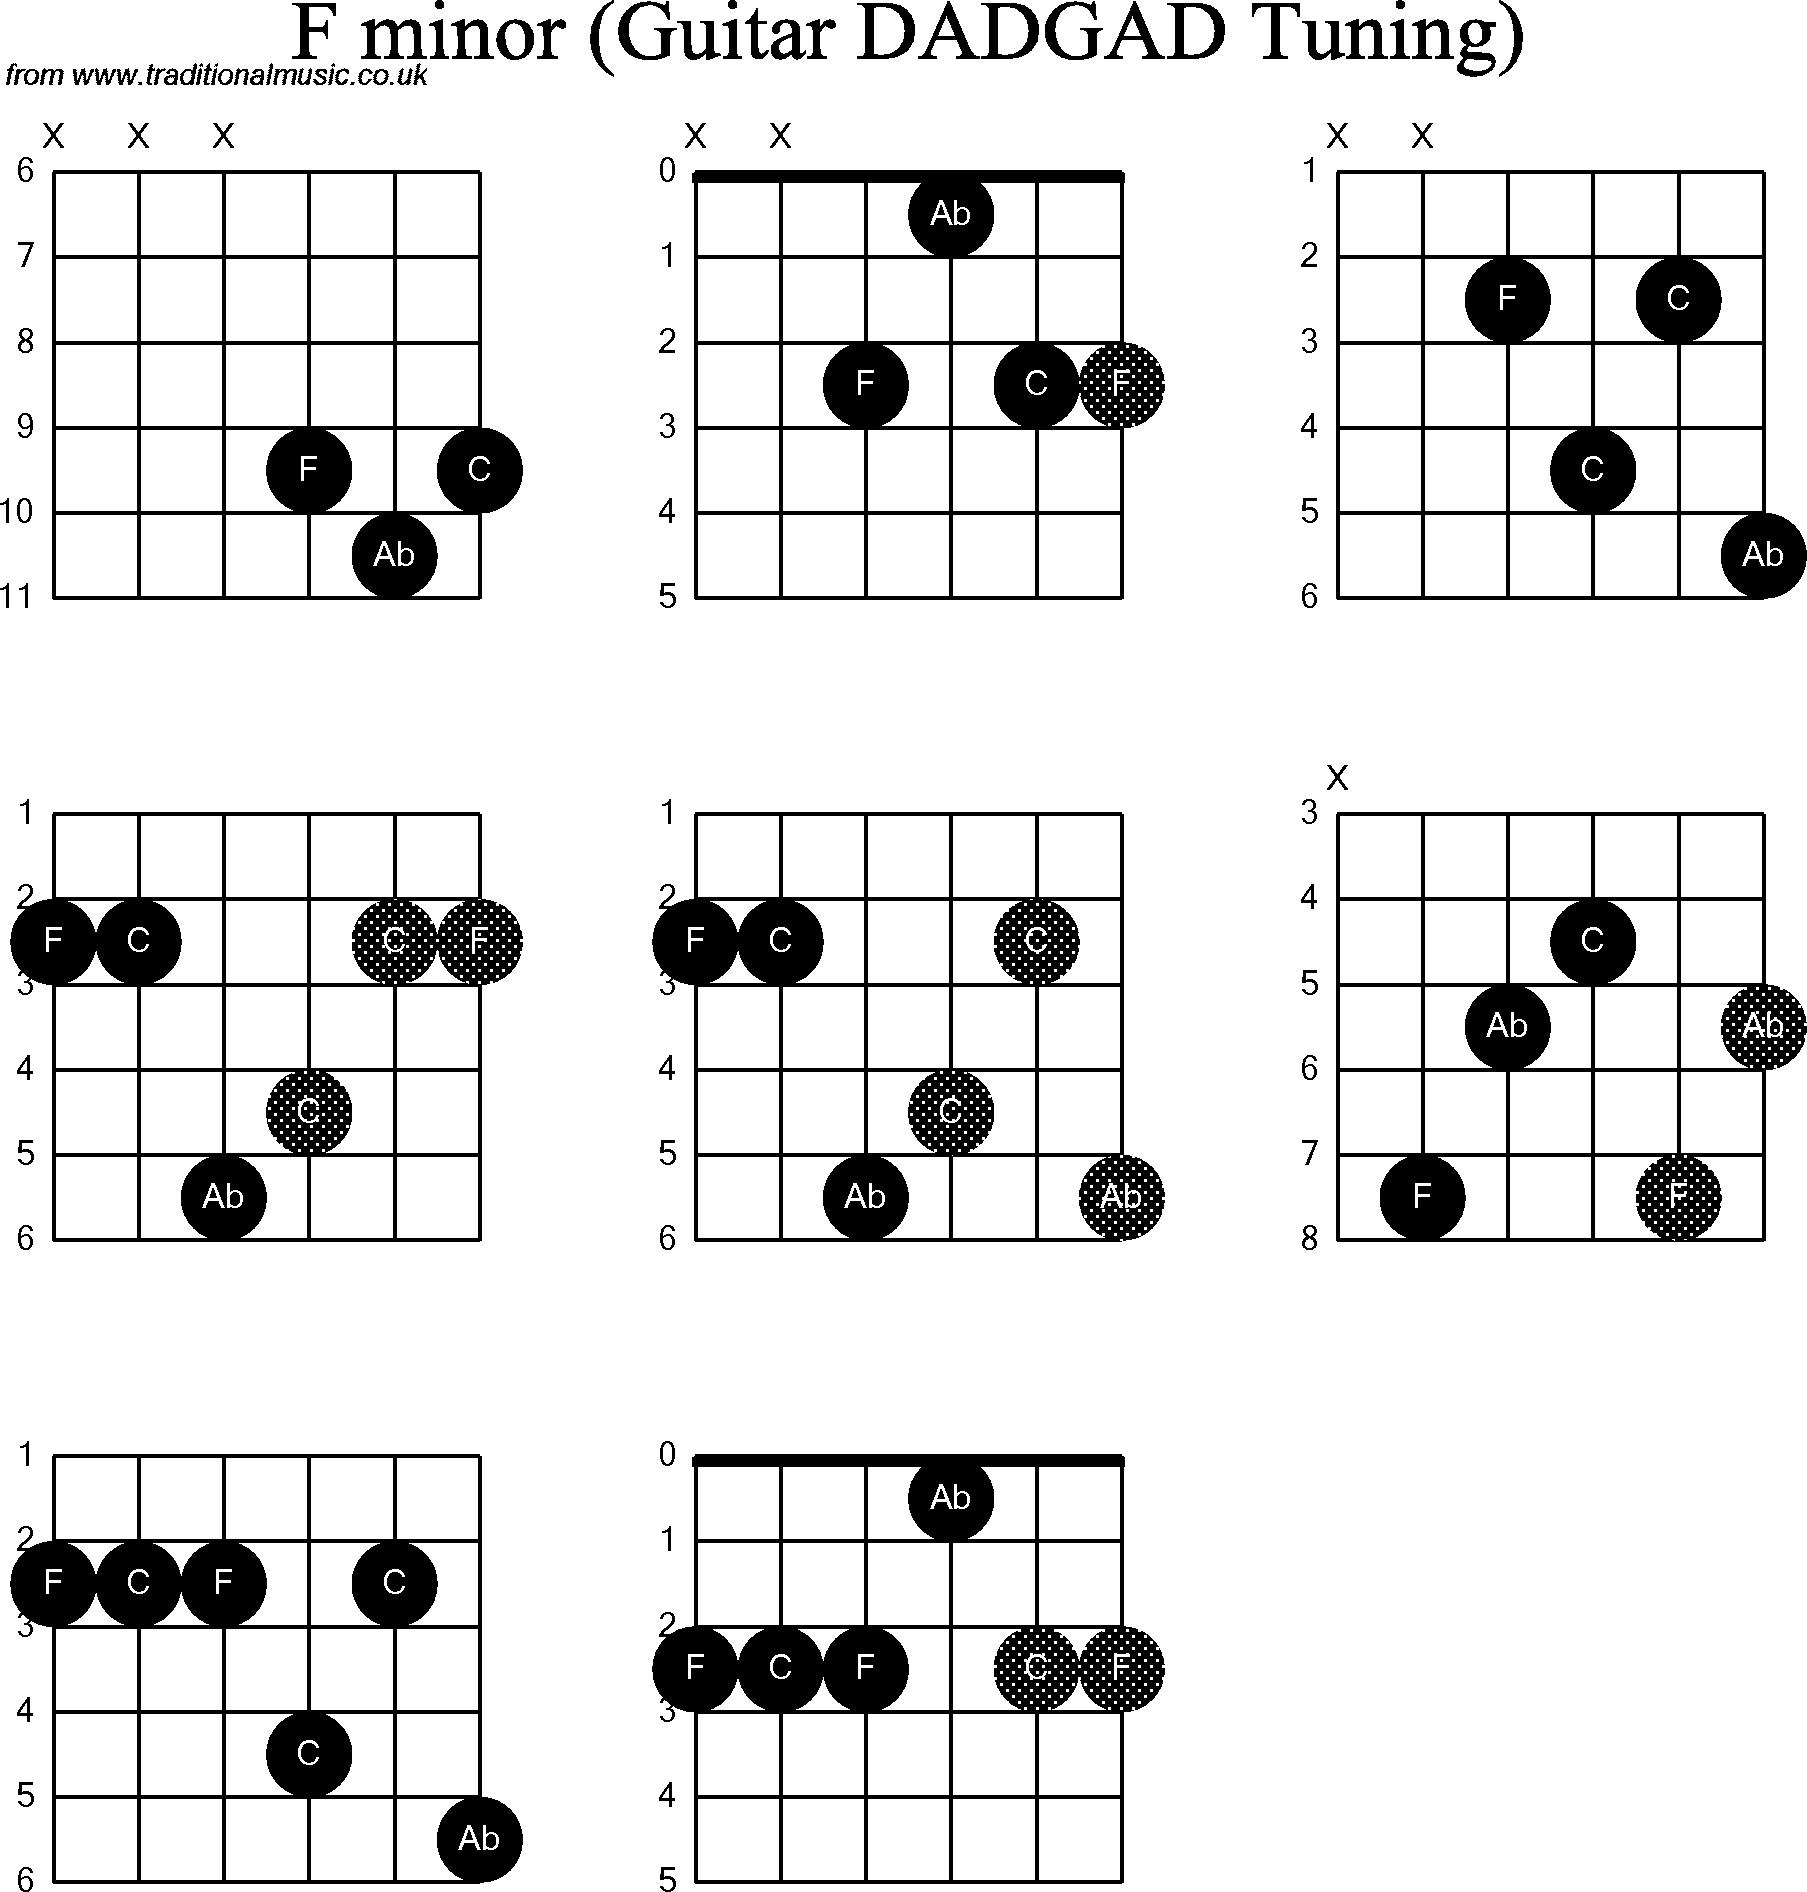 F Chord On Guitar Chord Diagrams D Modal Guitar Dadgad F Minor